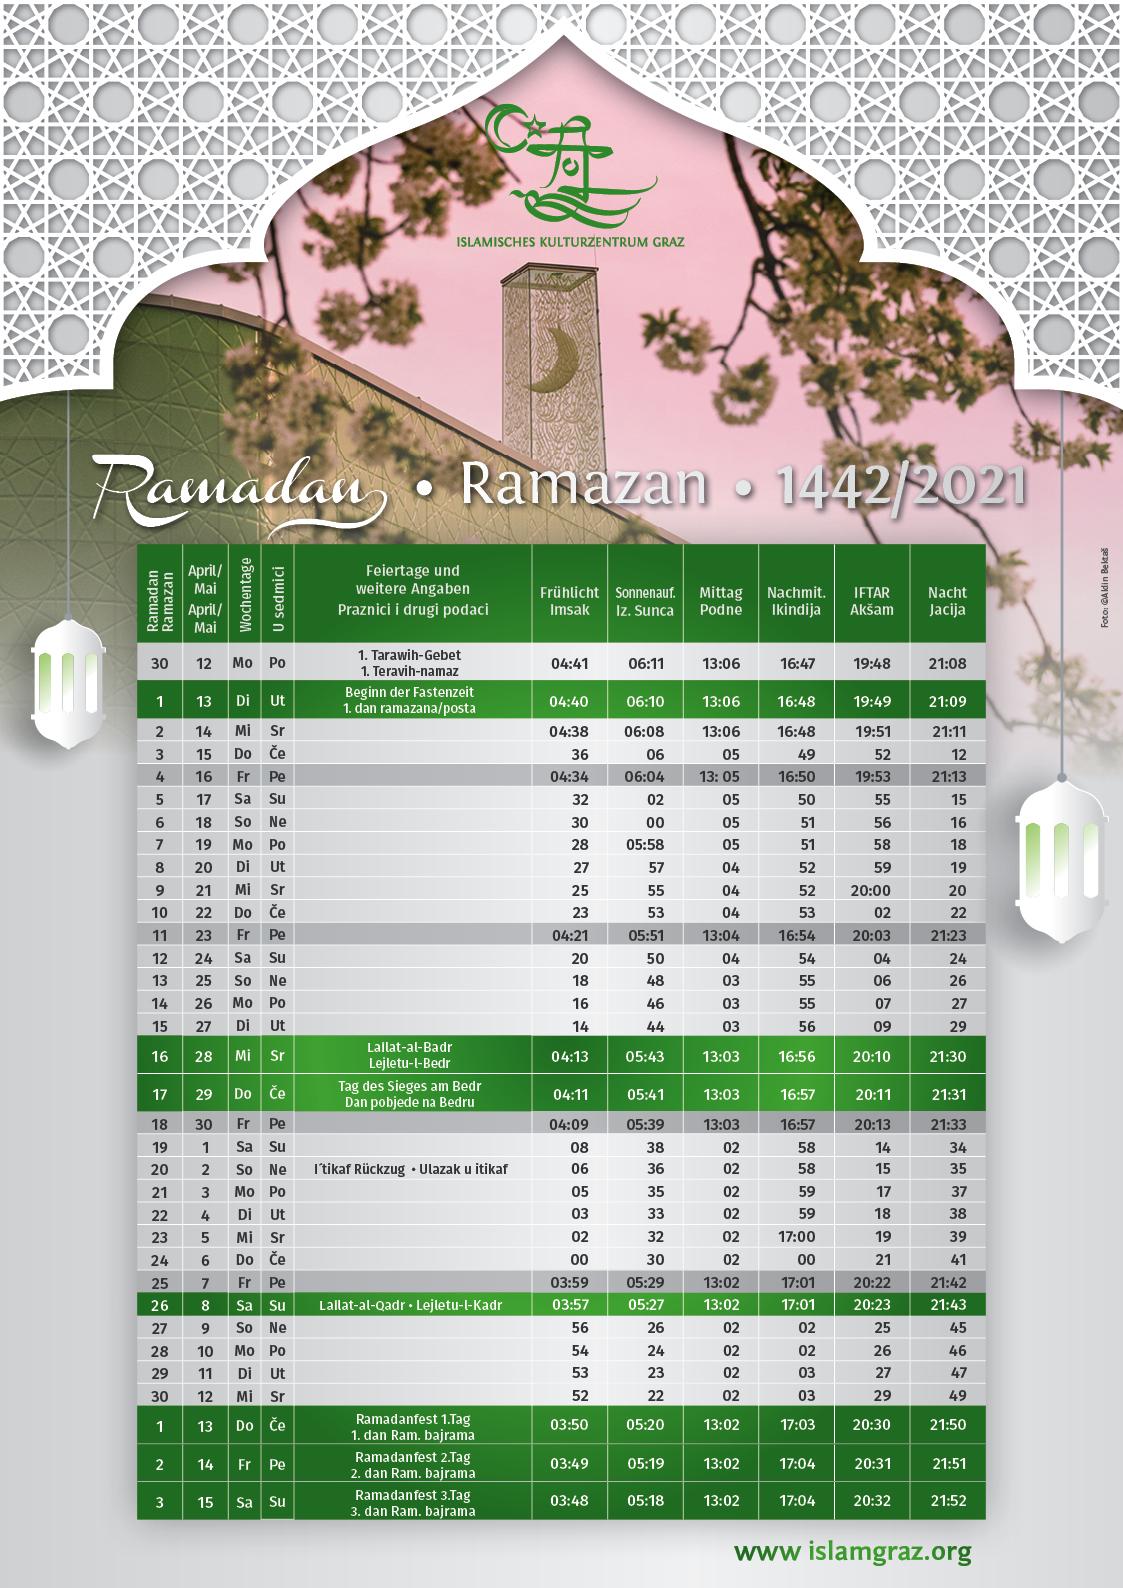 Ramadan Gebetszeiten Ramdanprogramm